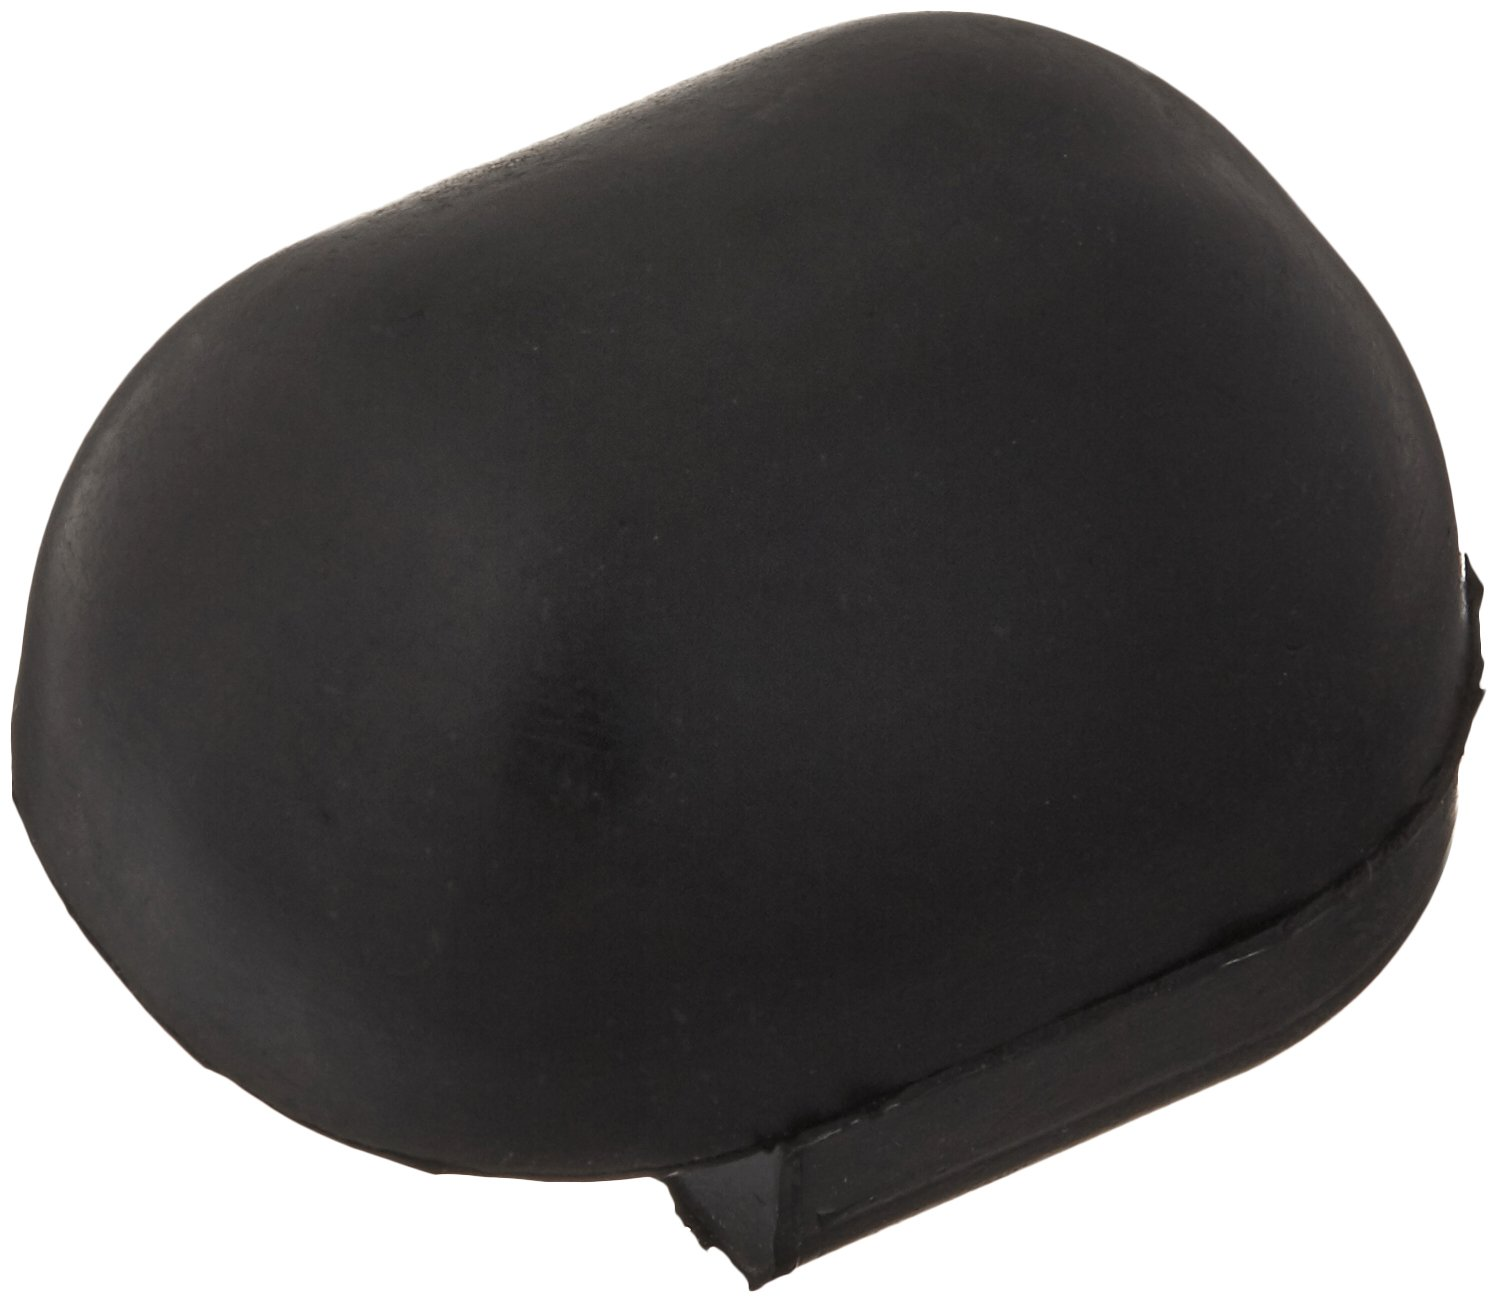 HardDrive 32-0444 Kickstand Rubber Pad Oe#50245-99,1 Pack